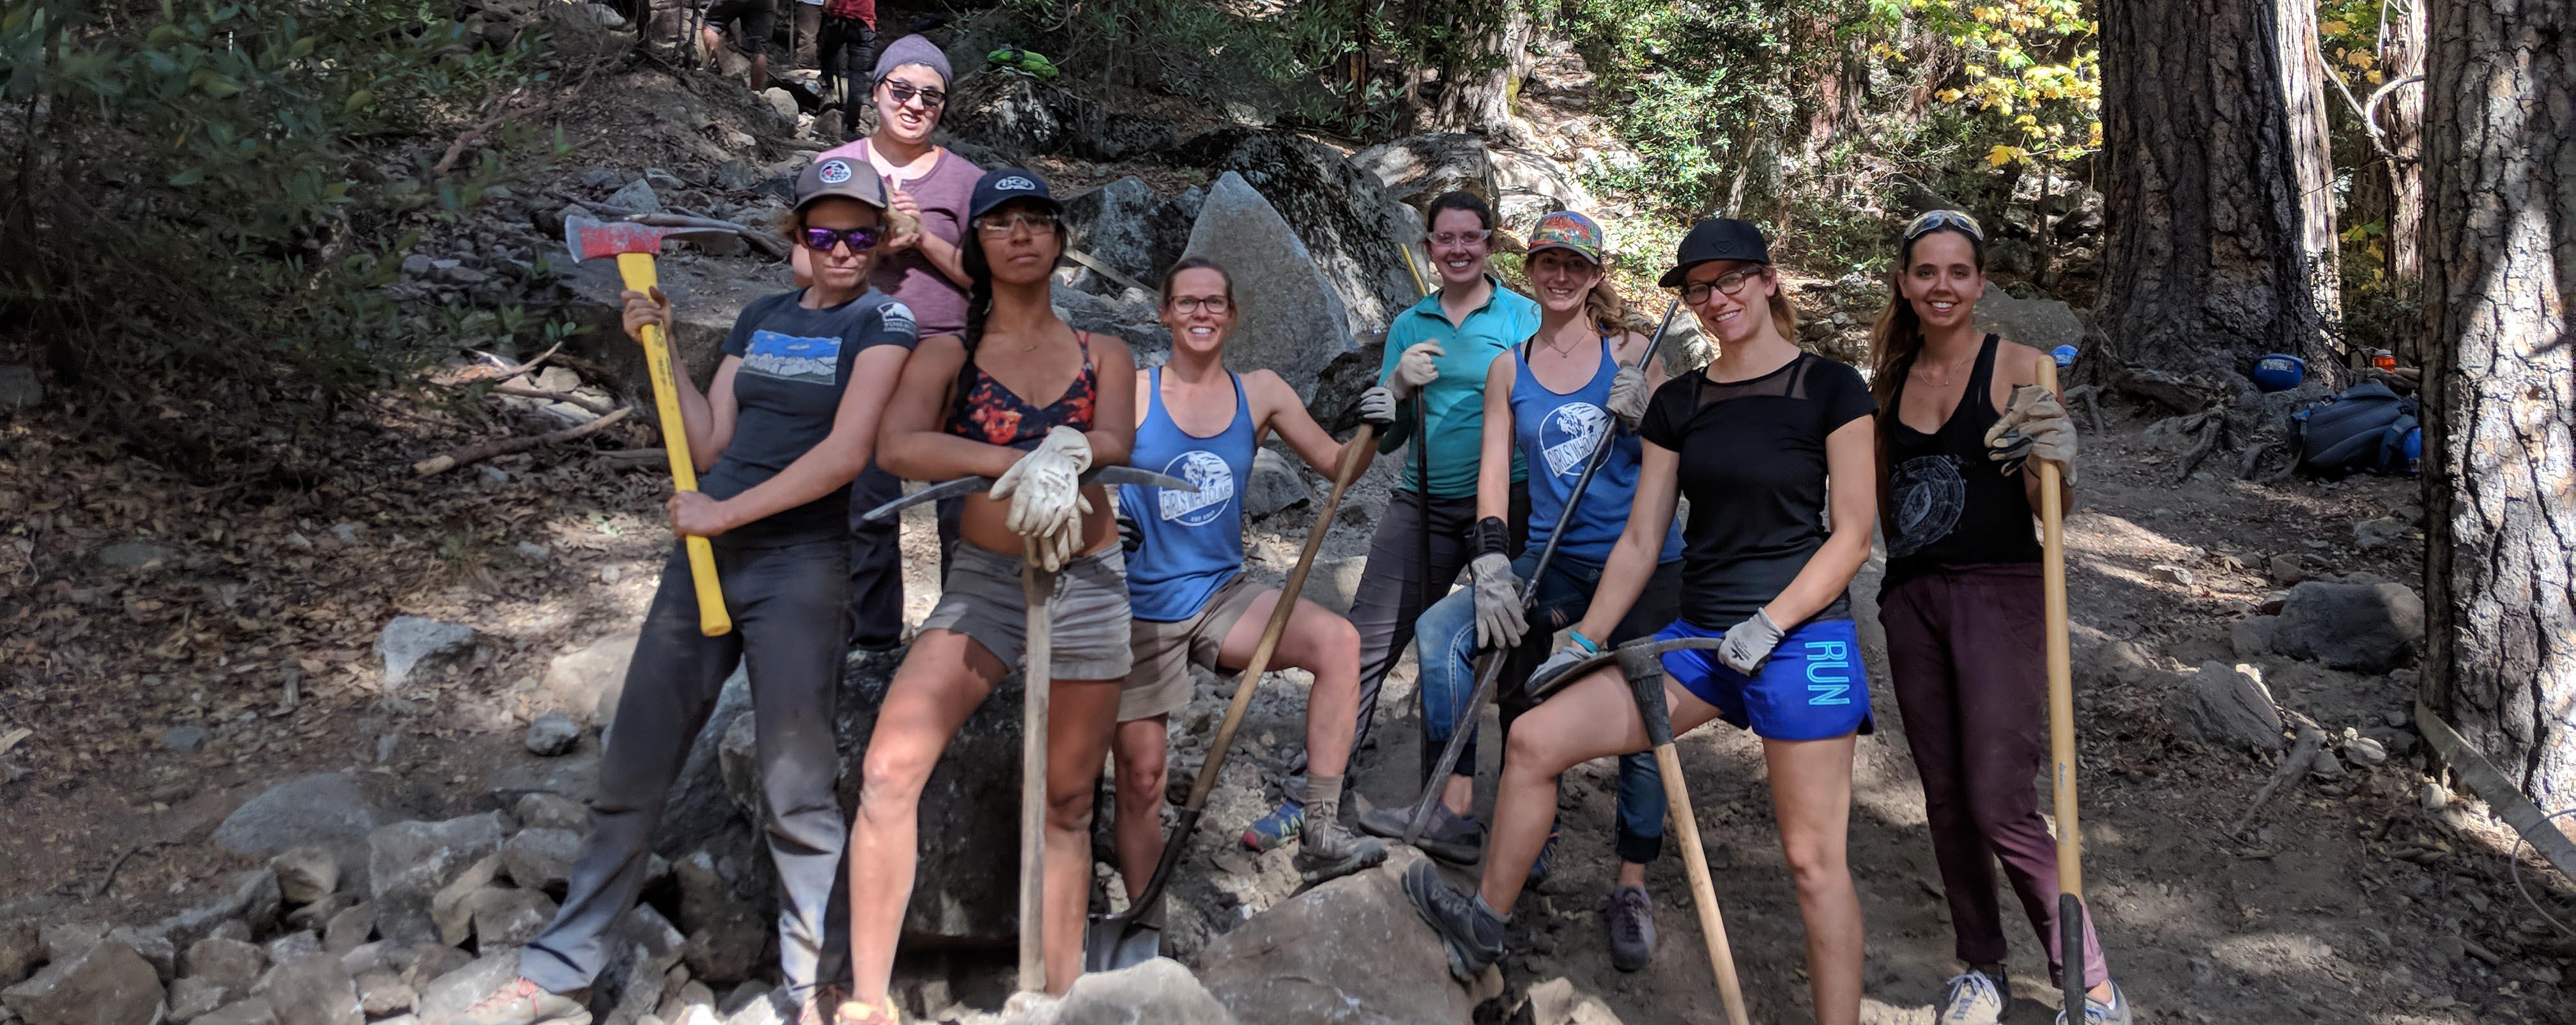 Yosemite Facelift Volunteers Pose